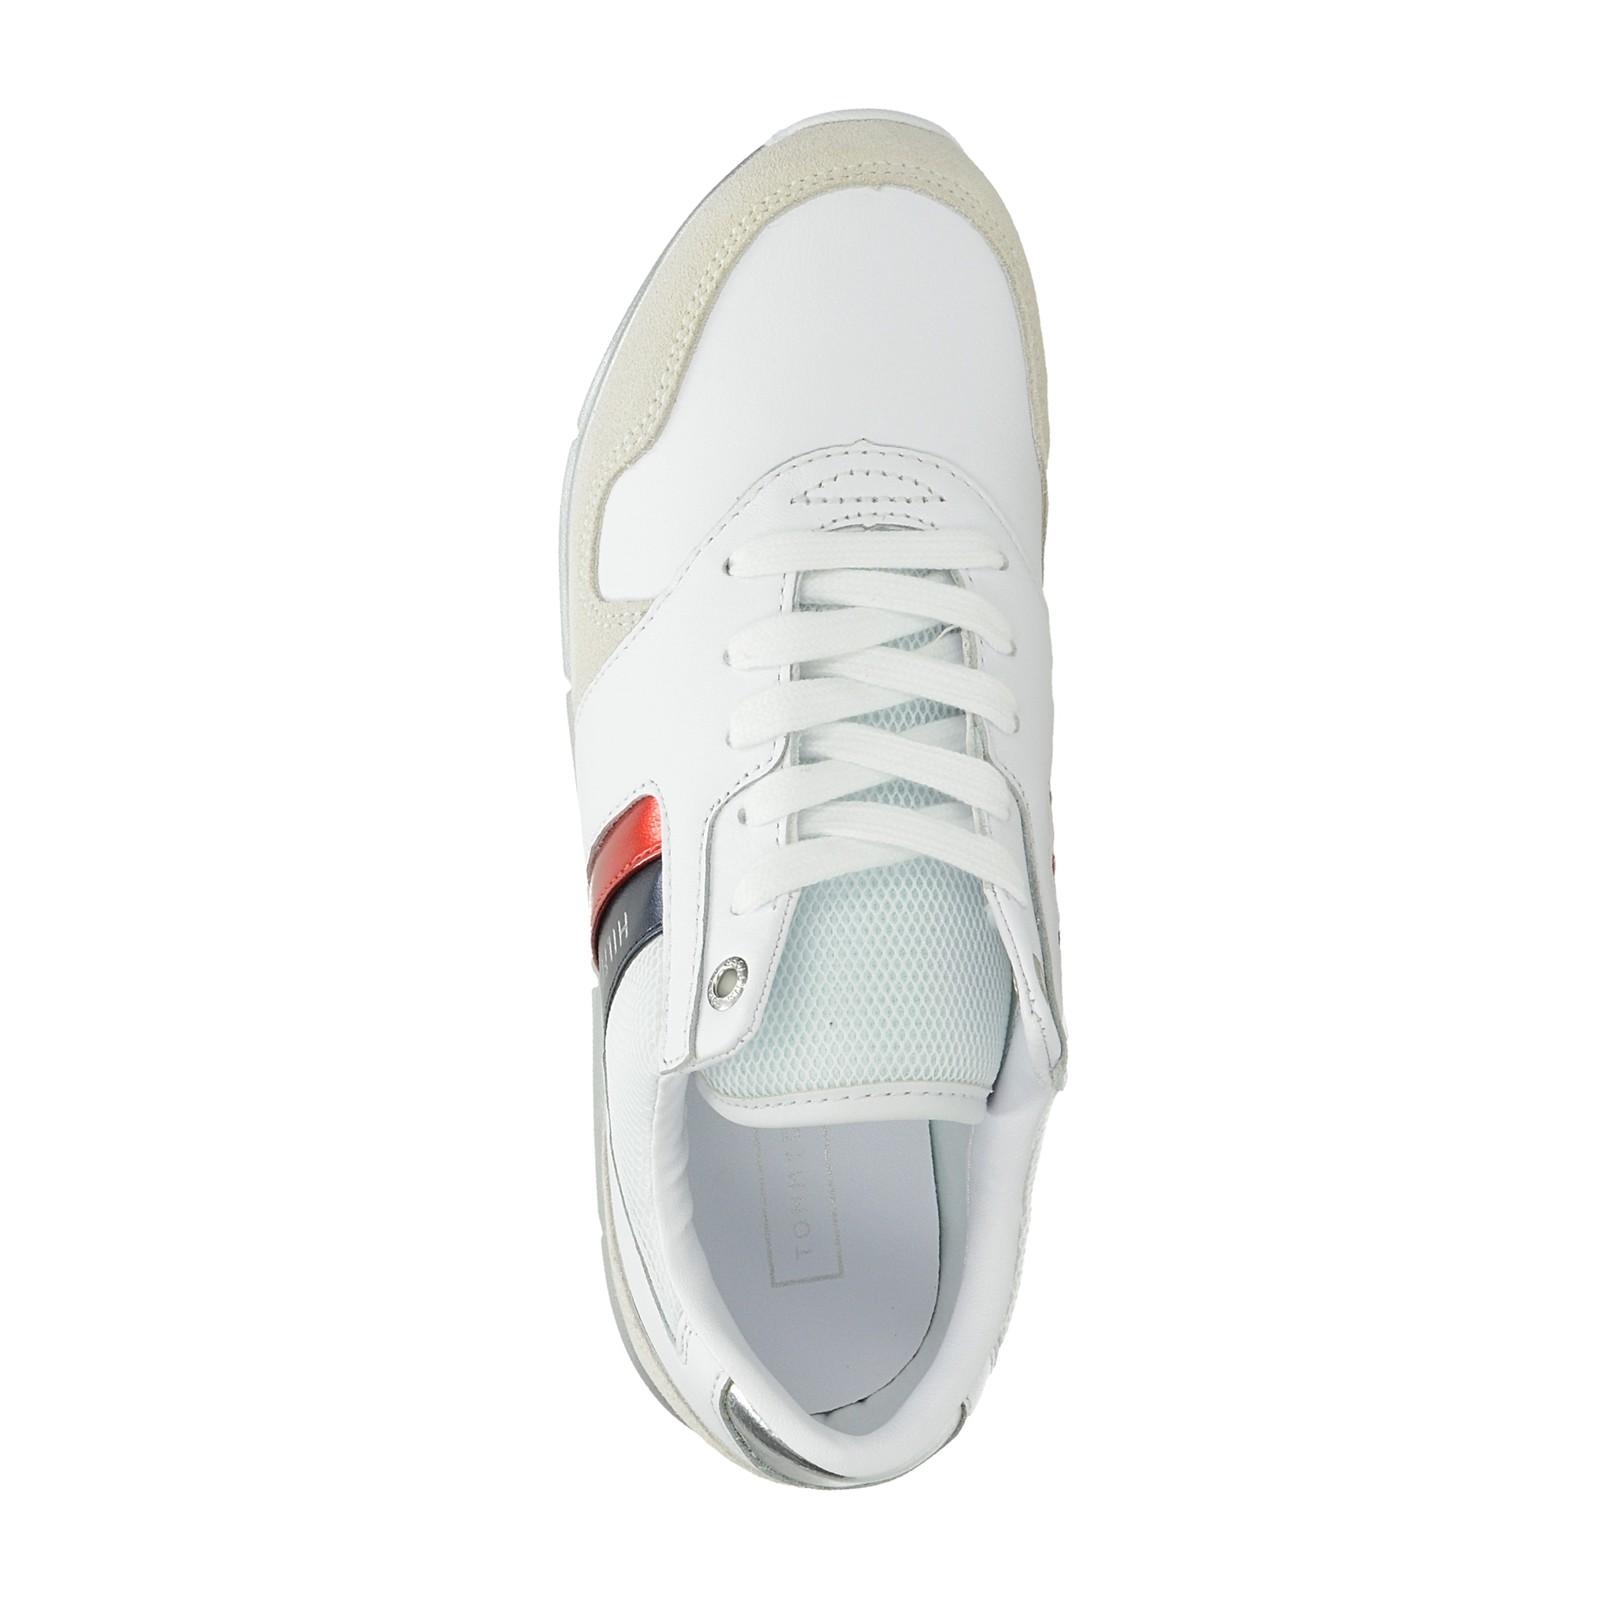 3f81d623f Tommy Hilfiger dámske štýlové tenisky - biele | FW0FW03785020-RWB ...